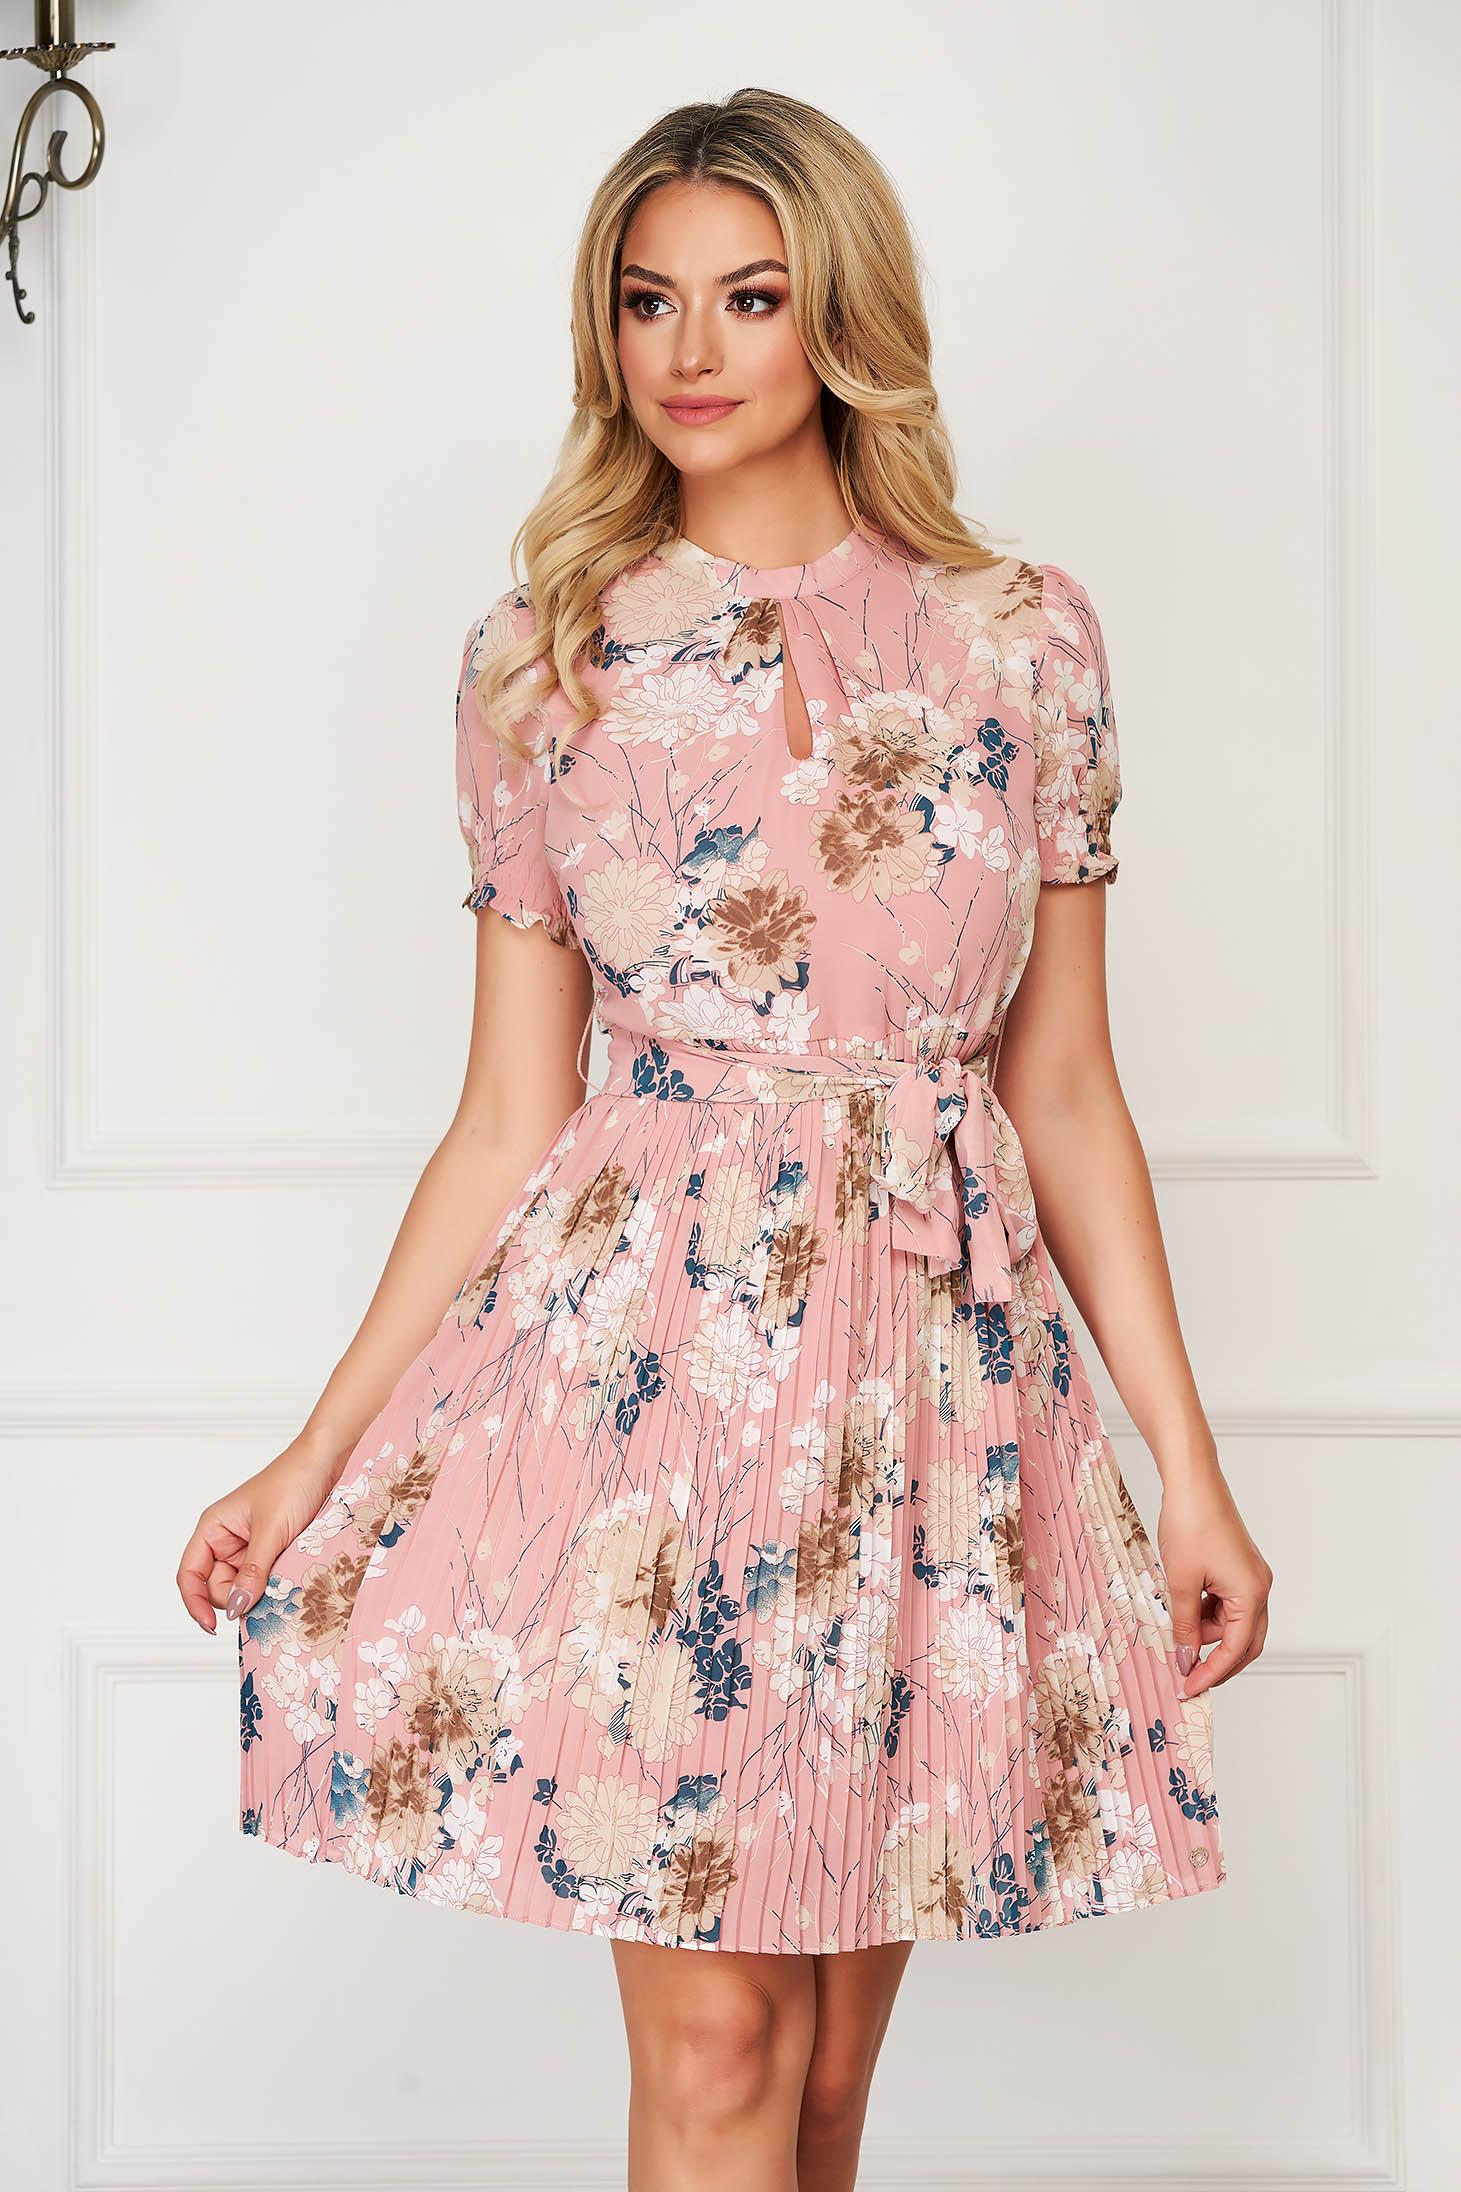 Lightpink dress midi daily cloche folded up thin fabric